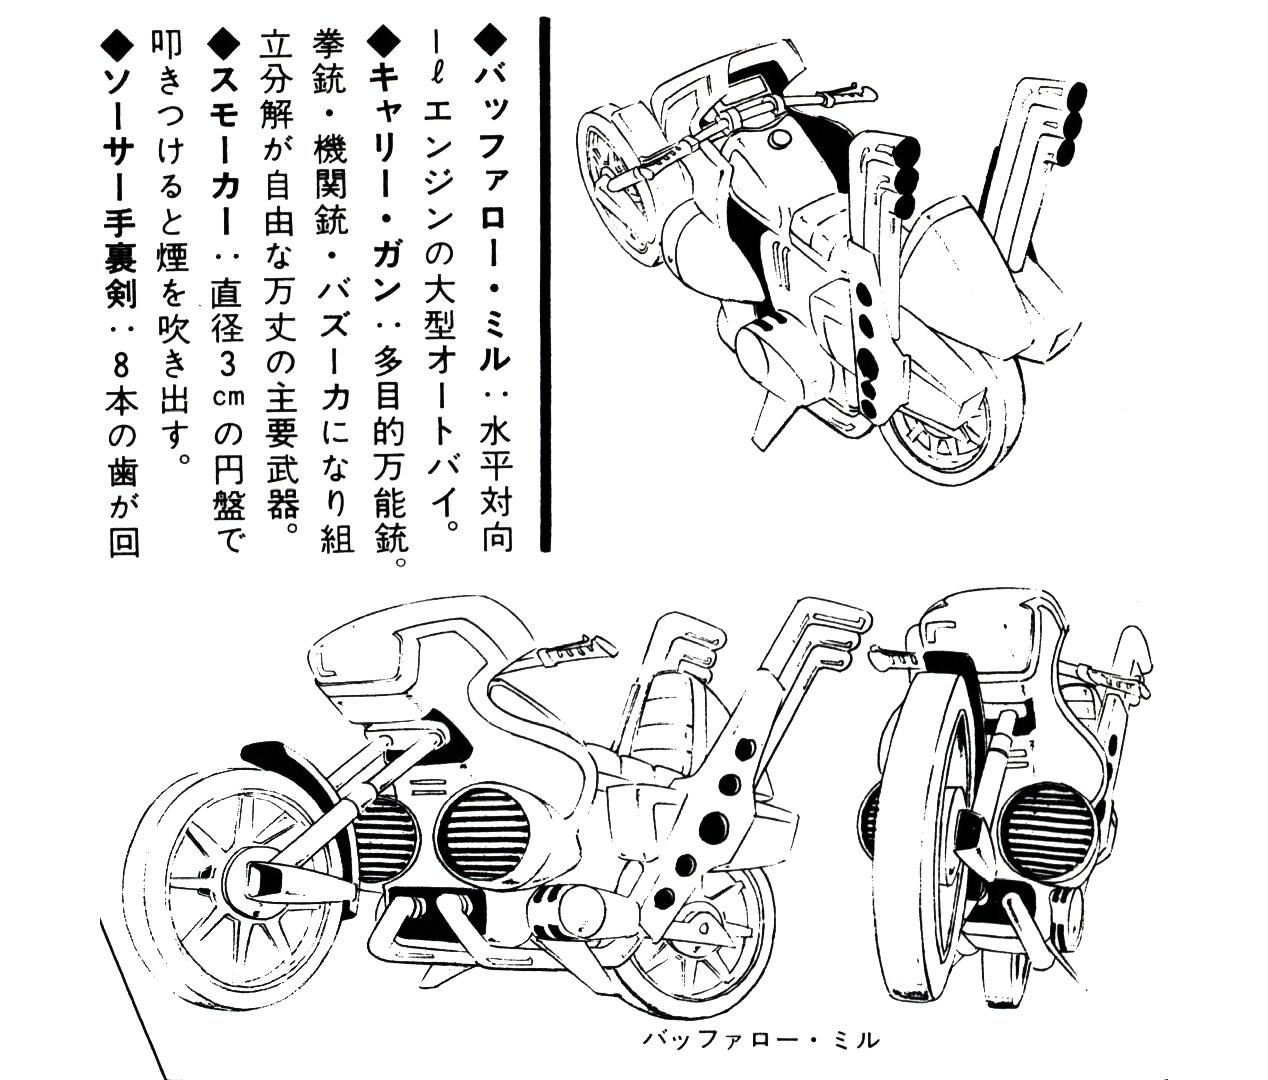 Daitarn3_settei_schizzi_055.jpg